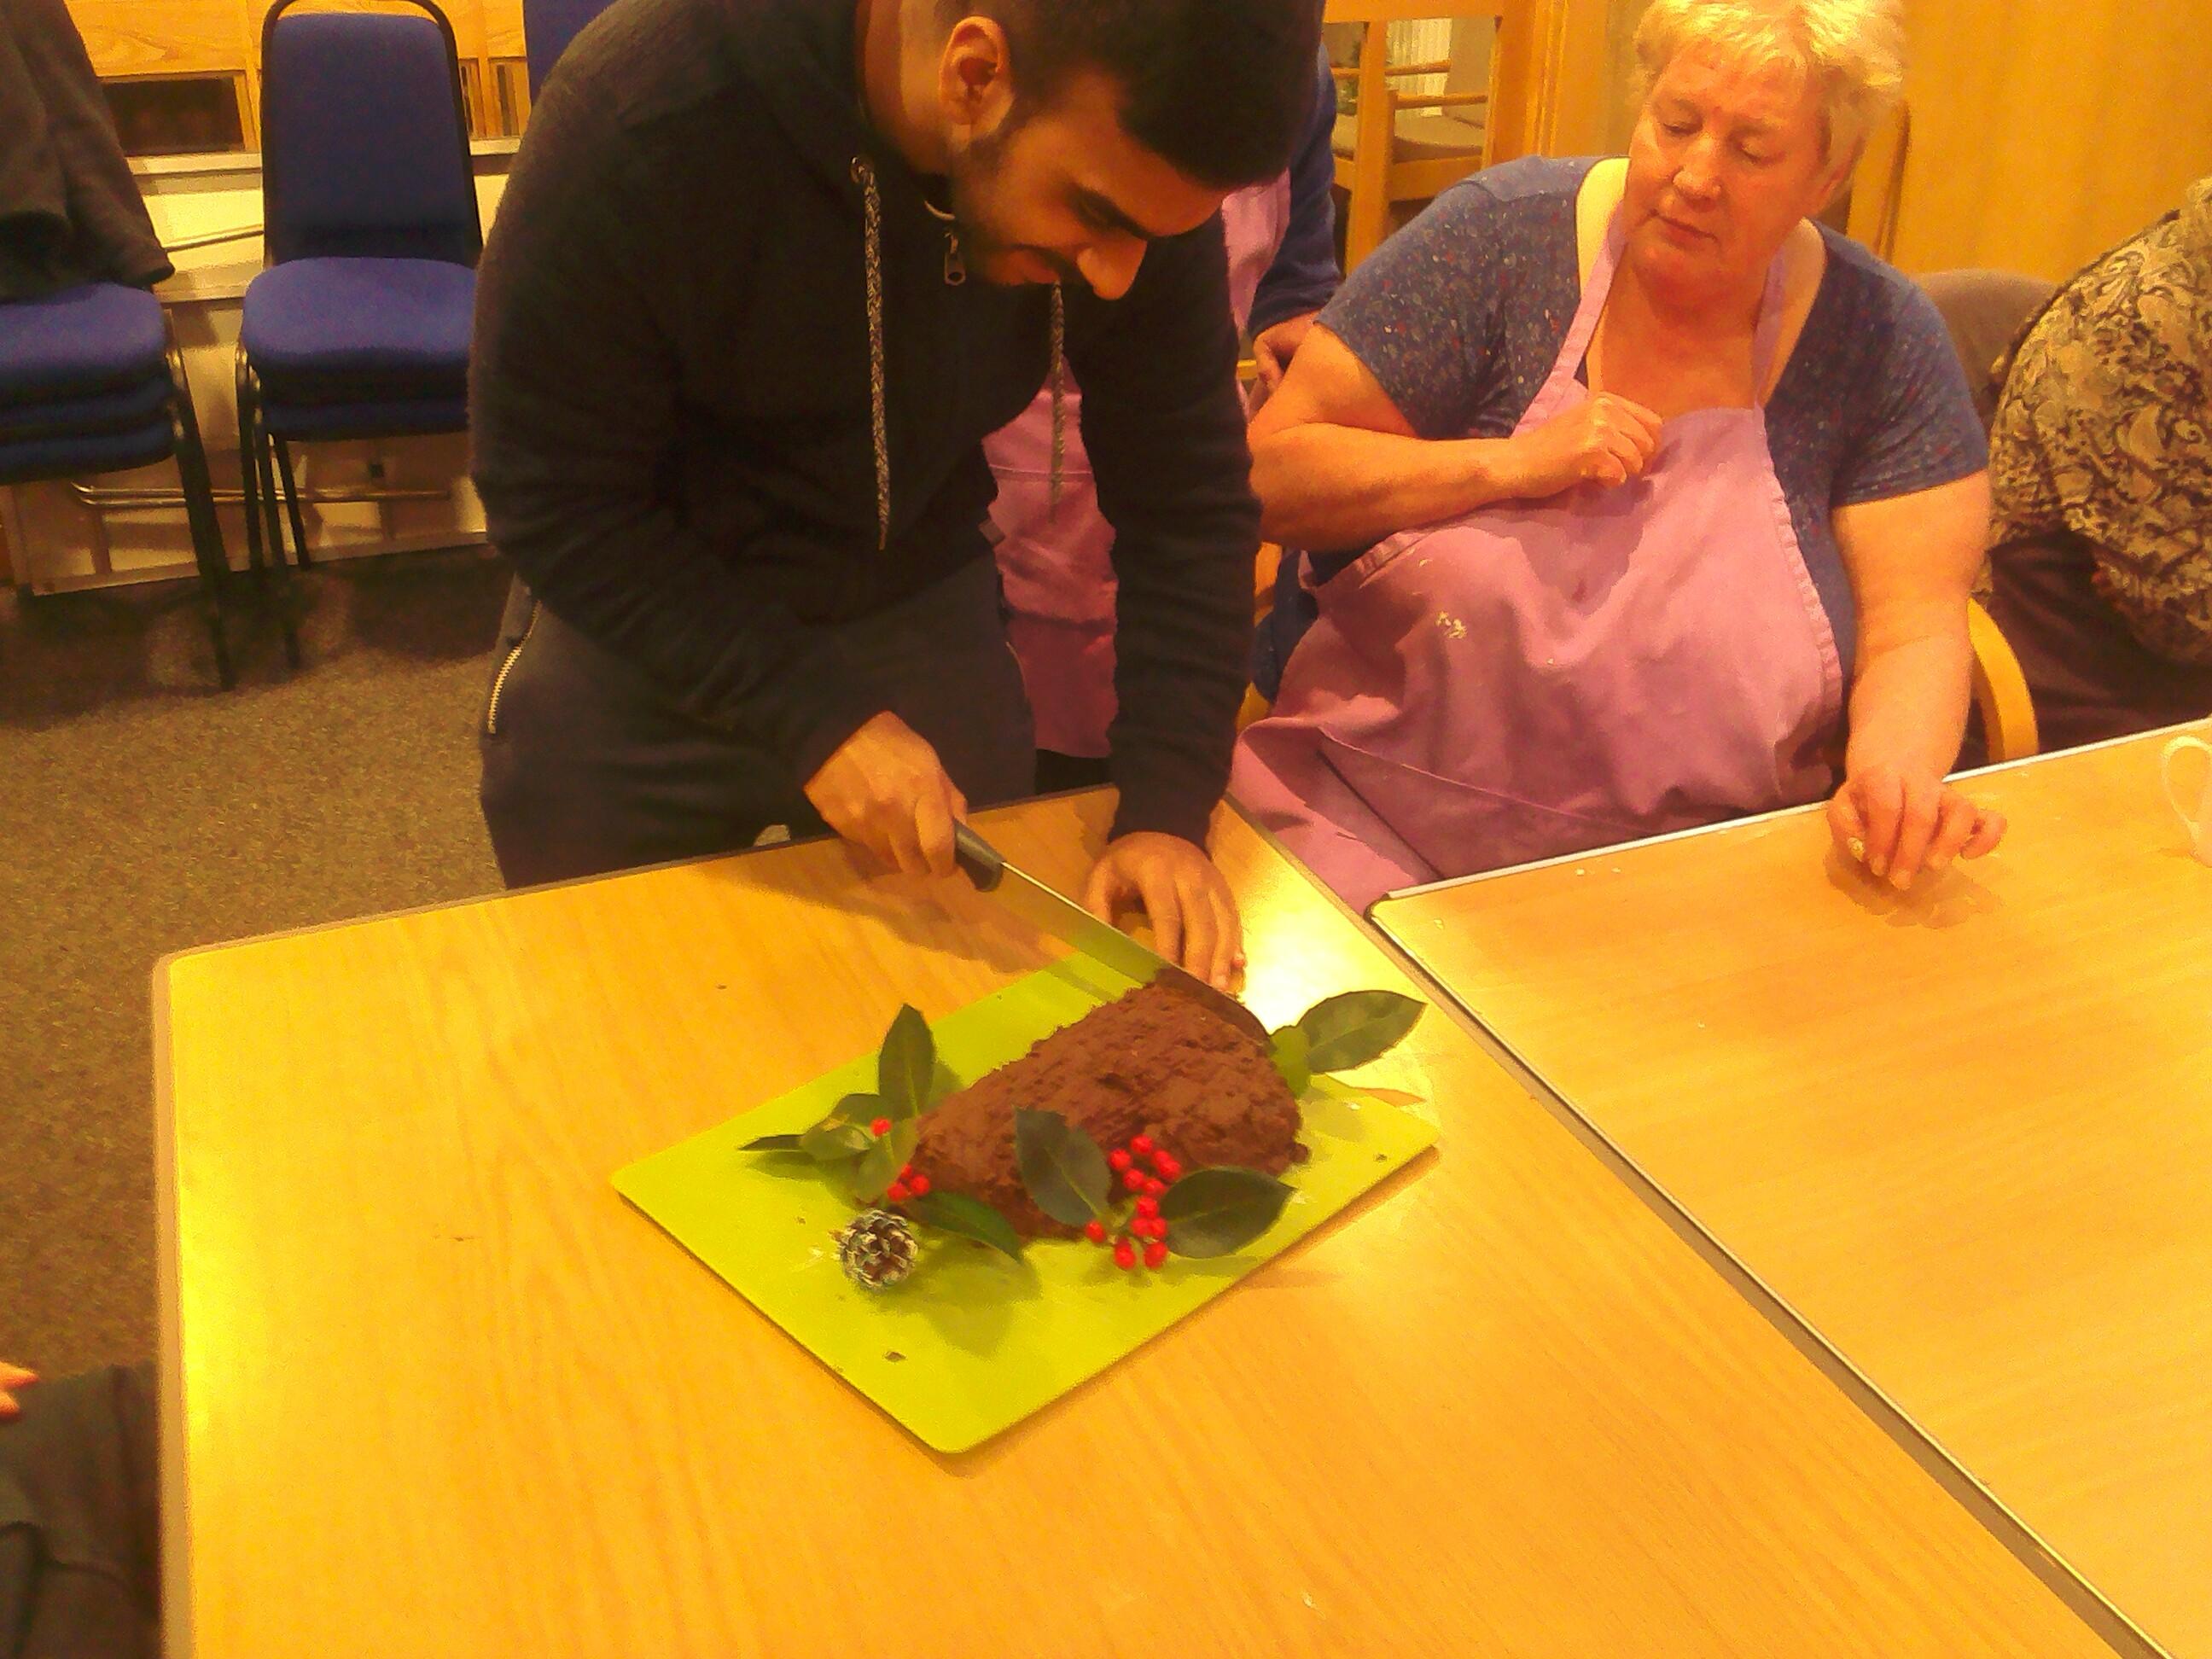 Cutting the chocolate log